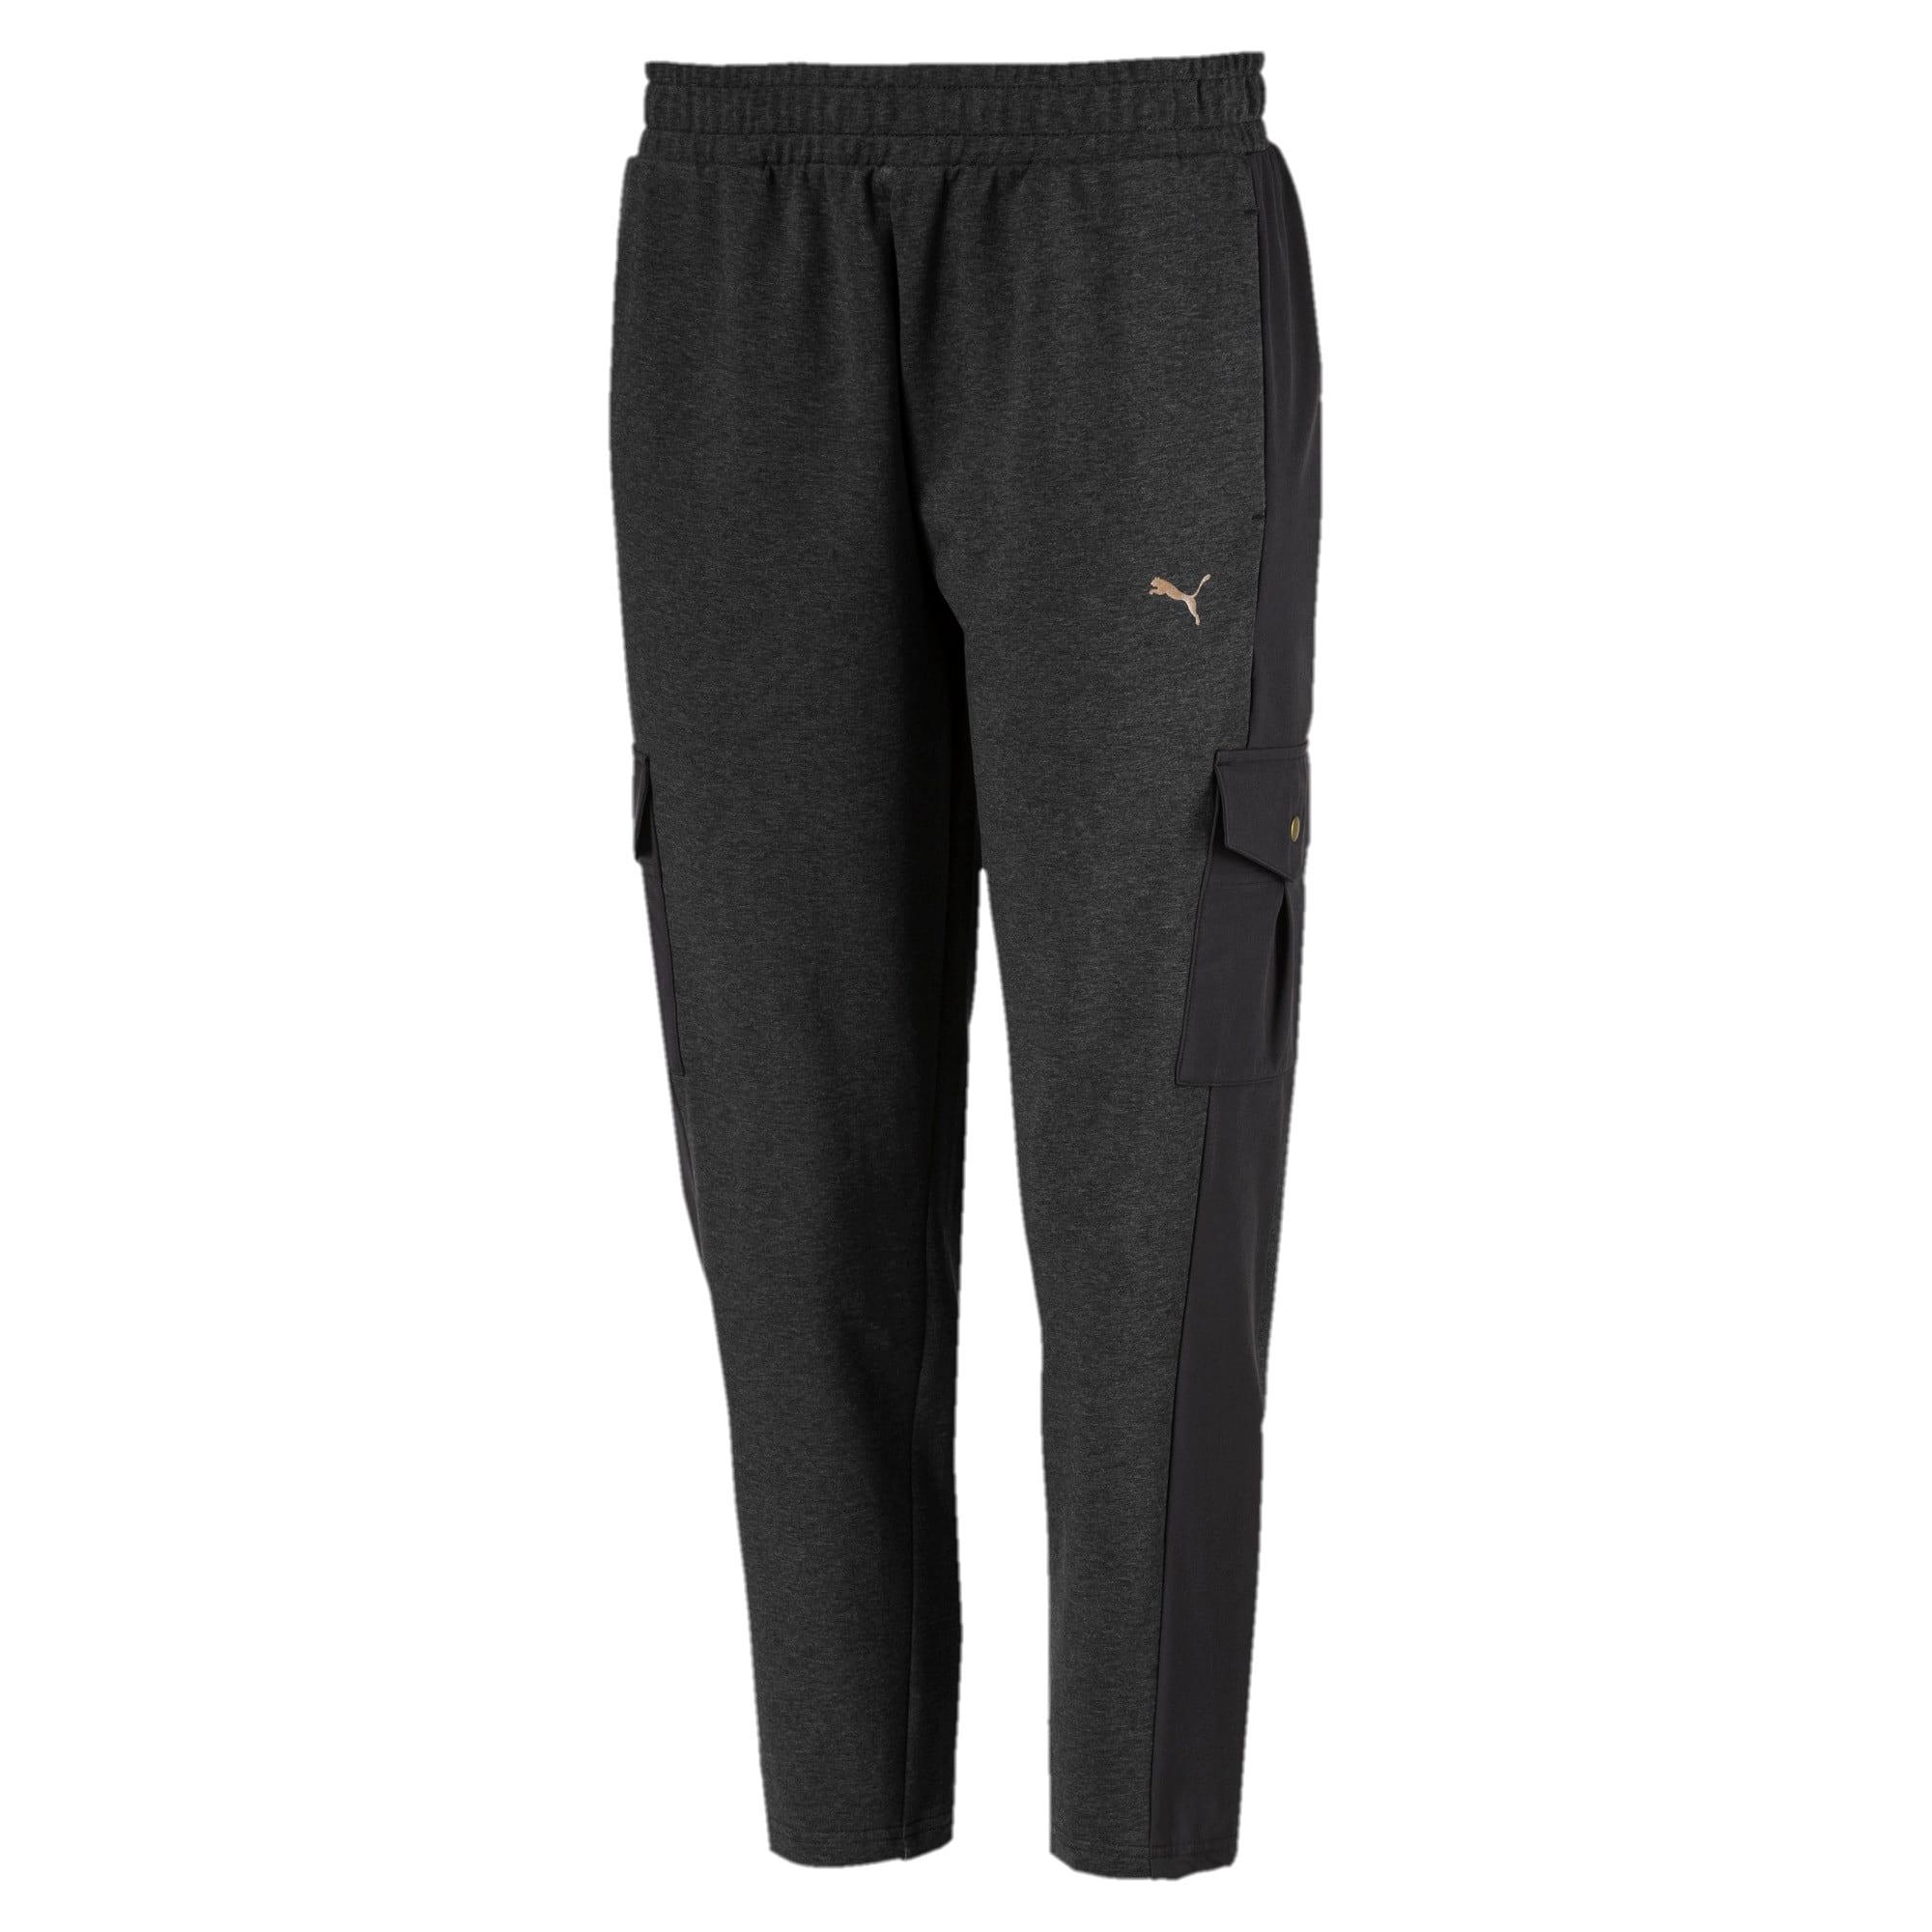 Thumbnail 1 of FUSION Pants, Dark Gray Heather, medium